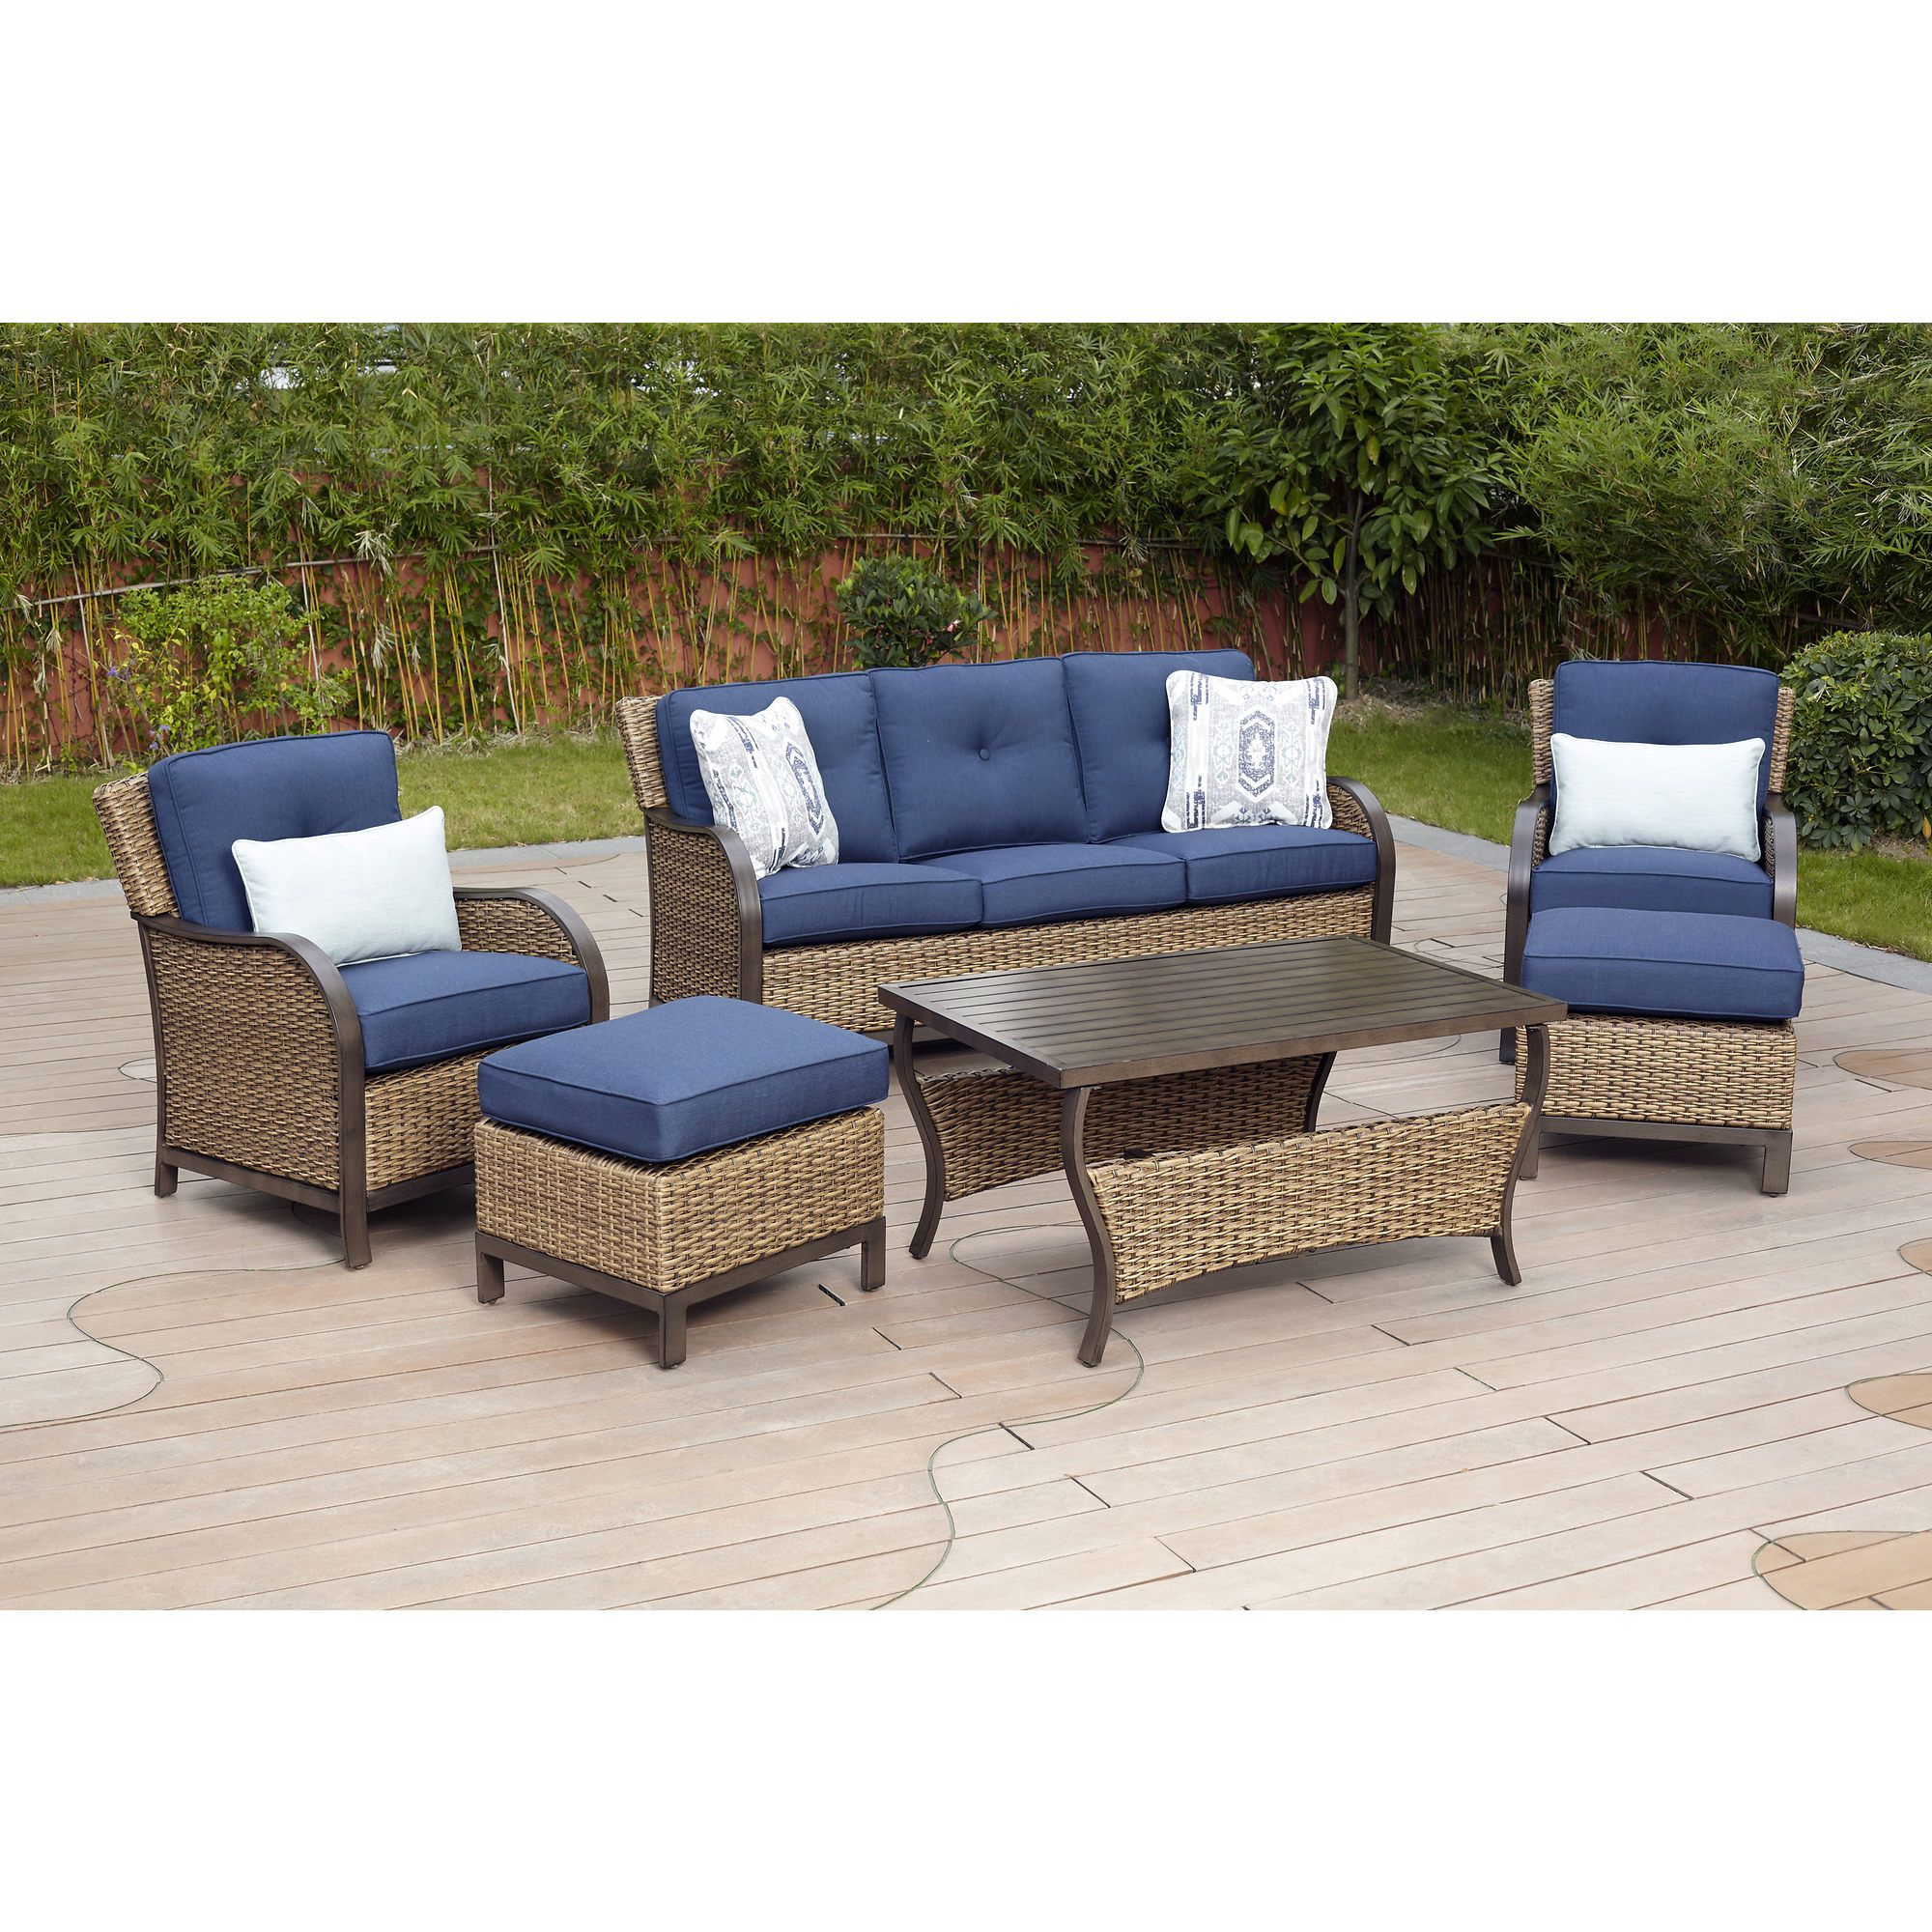 Berkley Jensen Nantucket 6 Pc Wicker Seating Set Spectrum Indigo Elegant Outdoor Furniture Wicker Sofa Outdoor Outdoor Furniture Sets